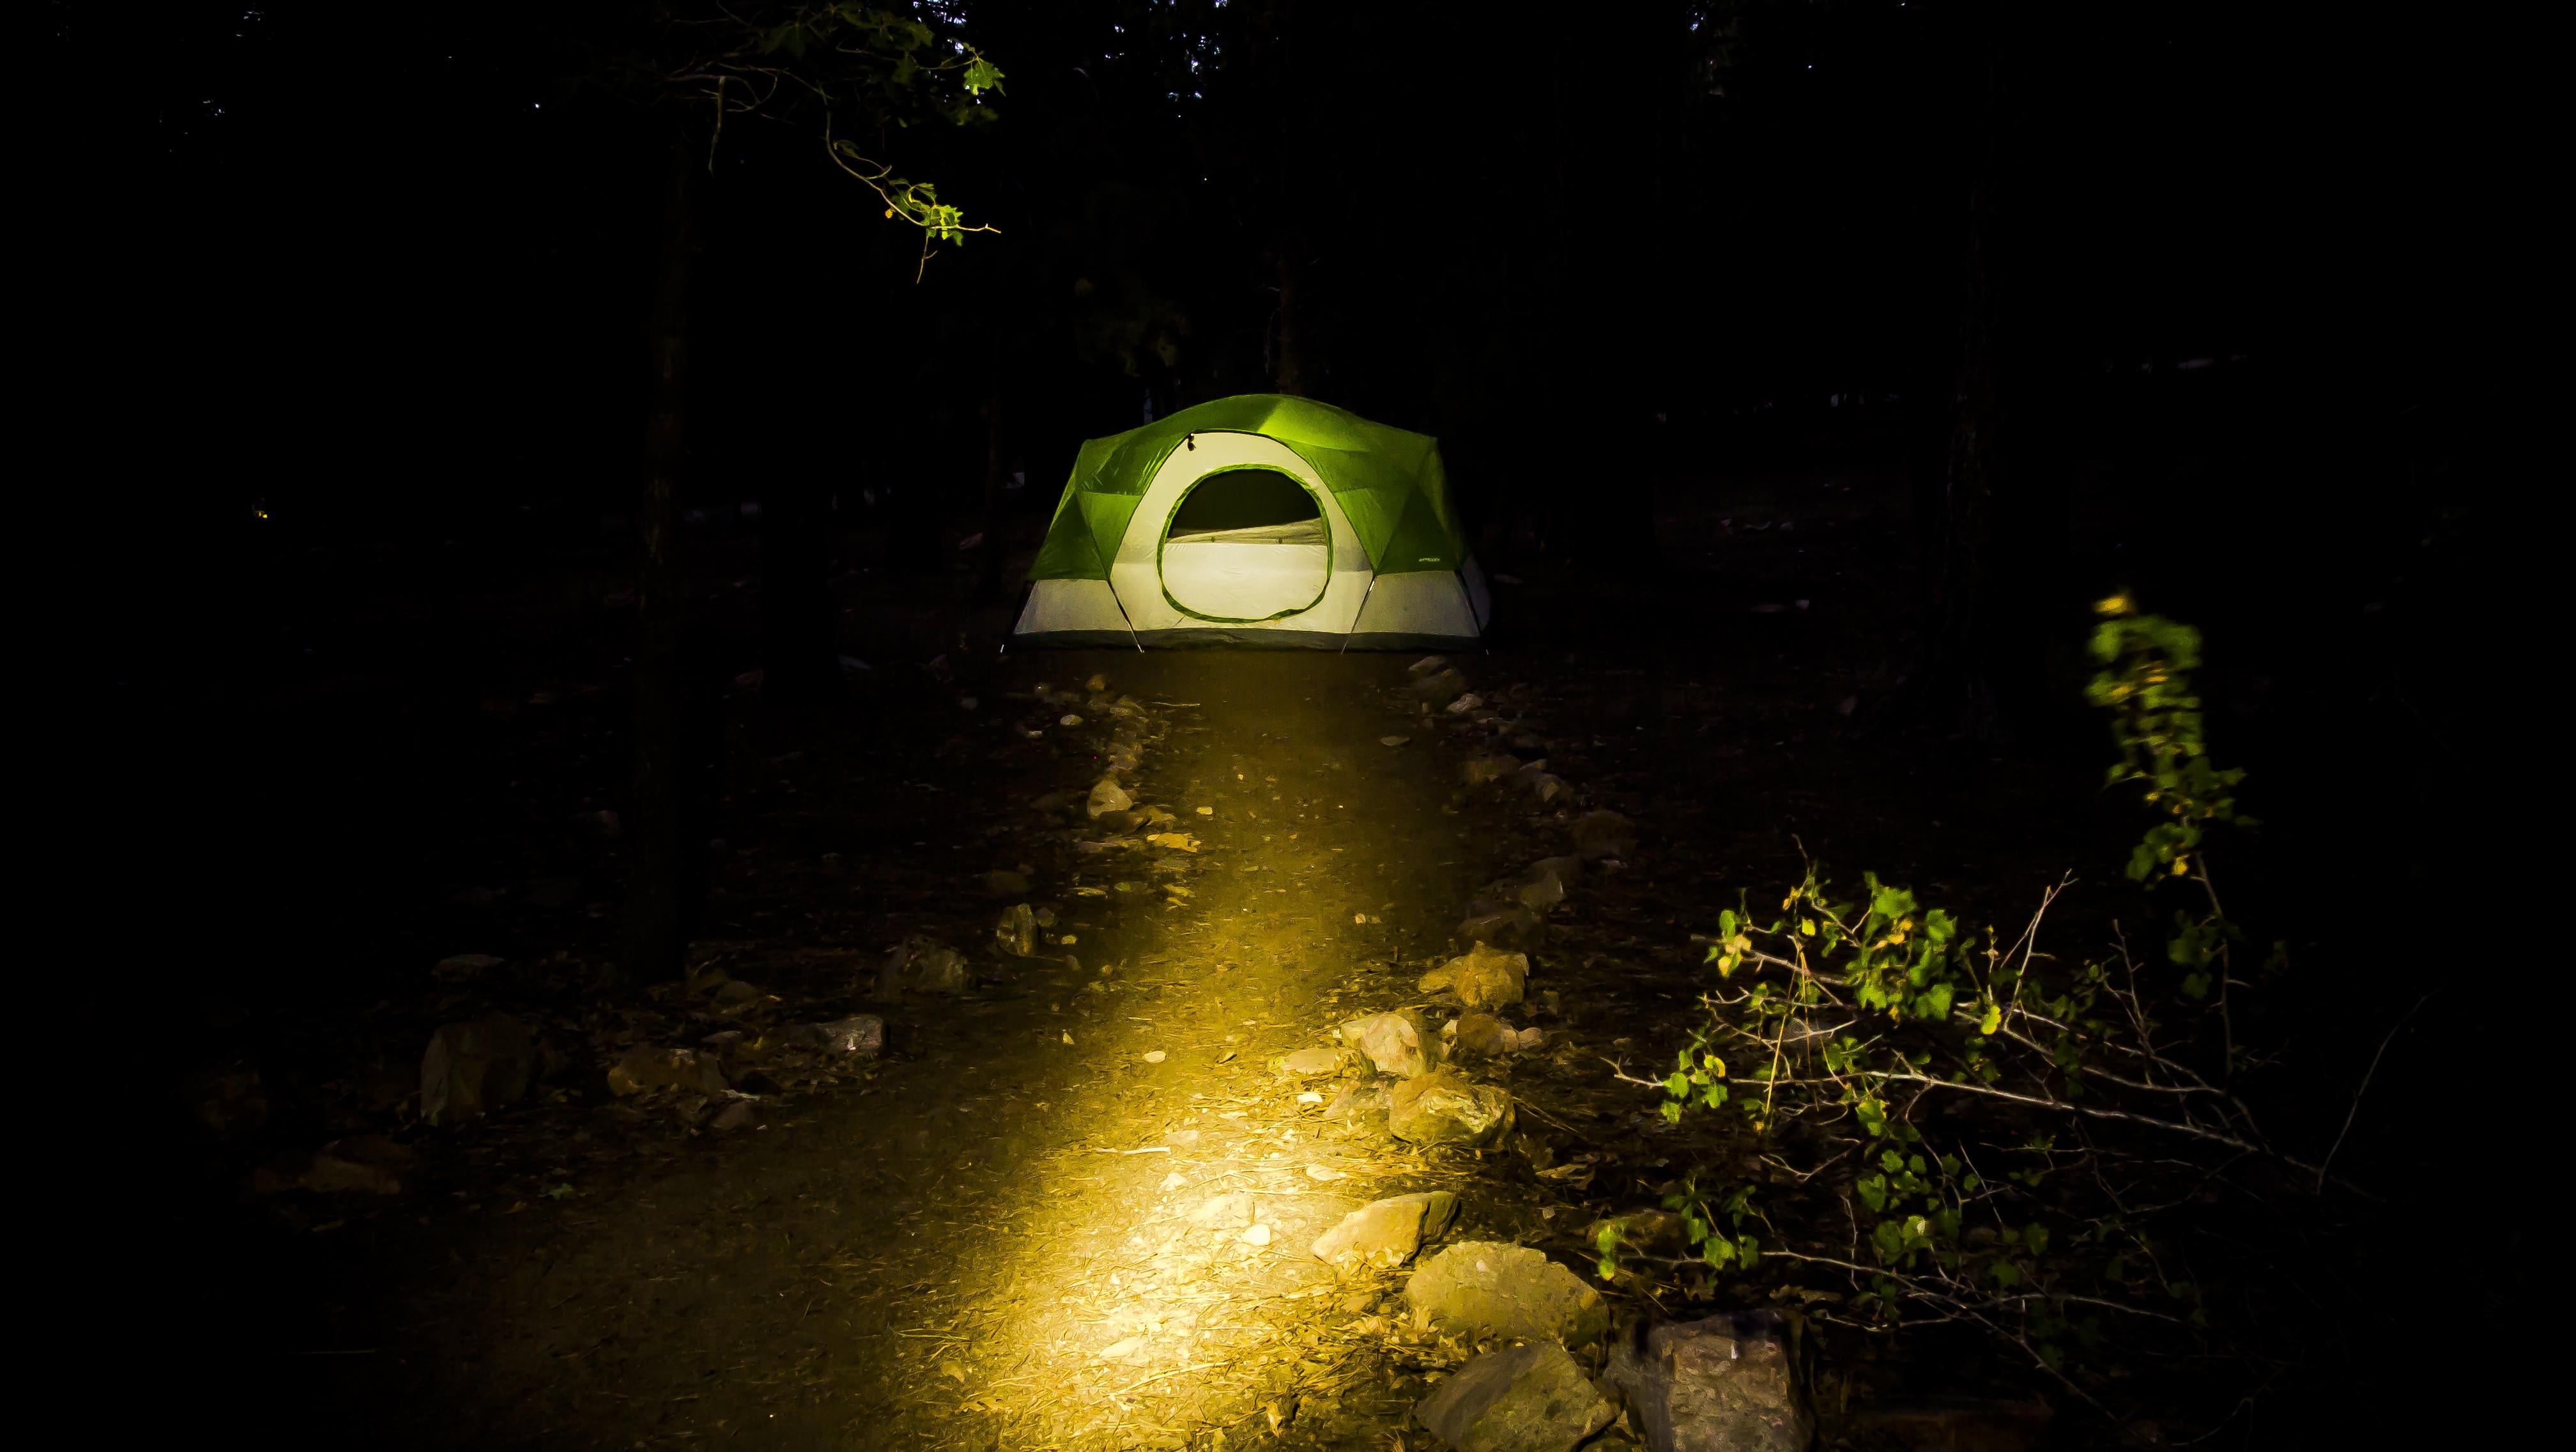 ... sunlight dark bear green reflection darkness street light yellow c&ing lighting tent long creativecommons scary shadows exposure san ... & Free Images : forest night sunlight dark bear green ...